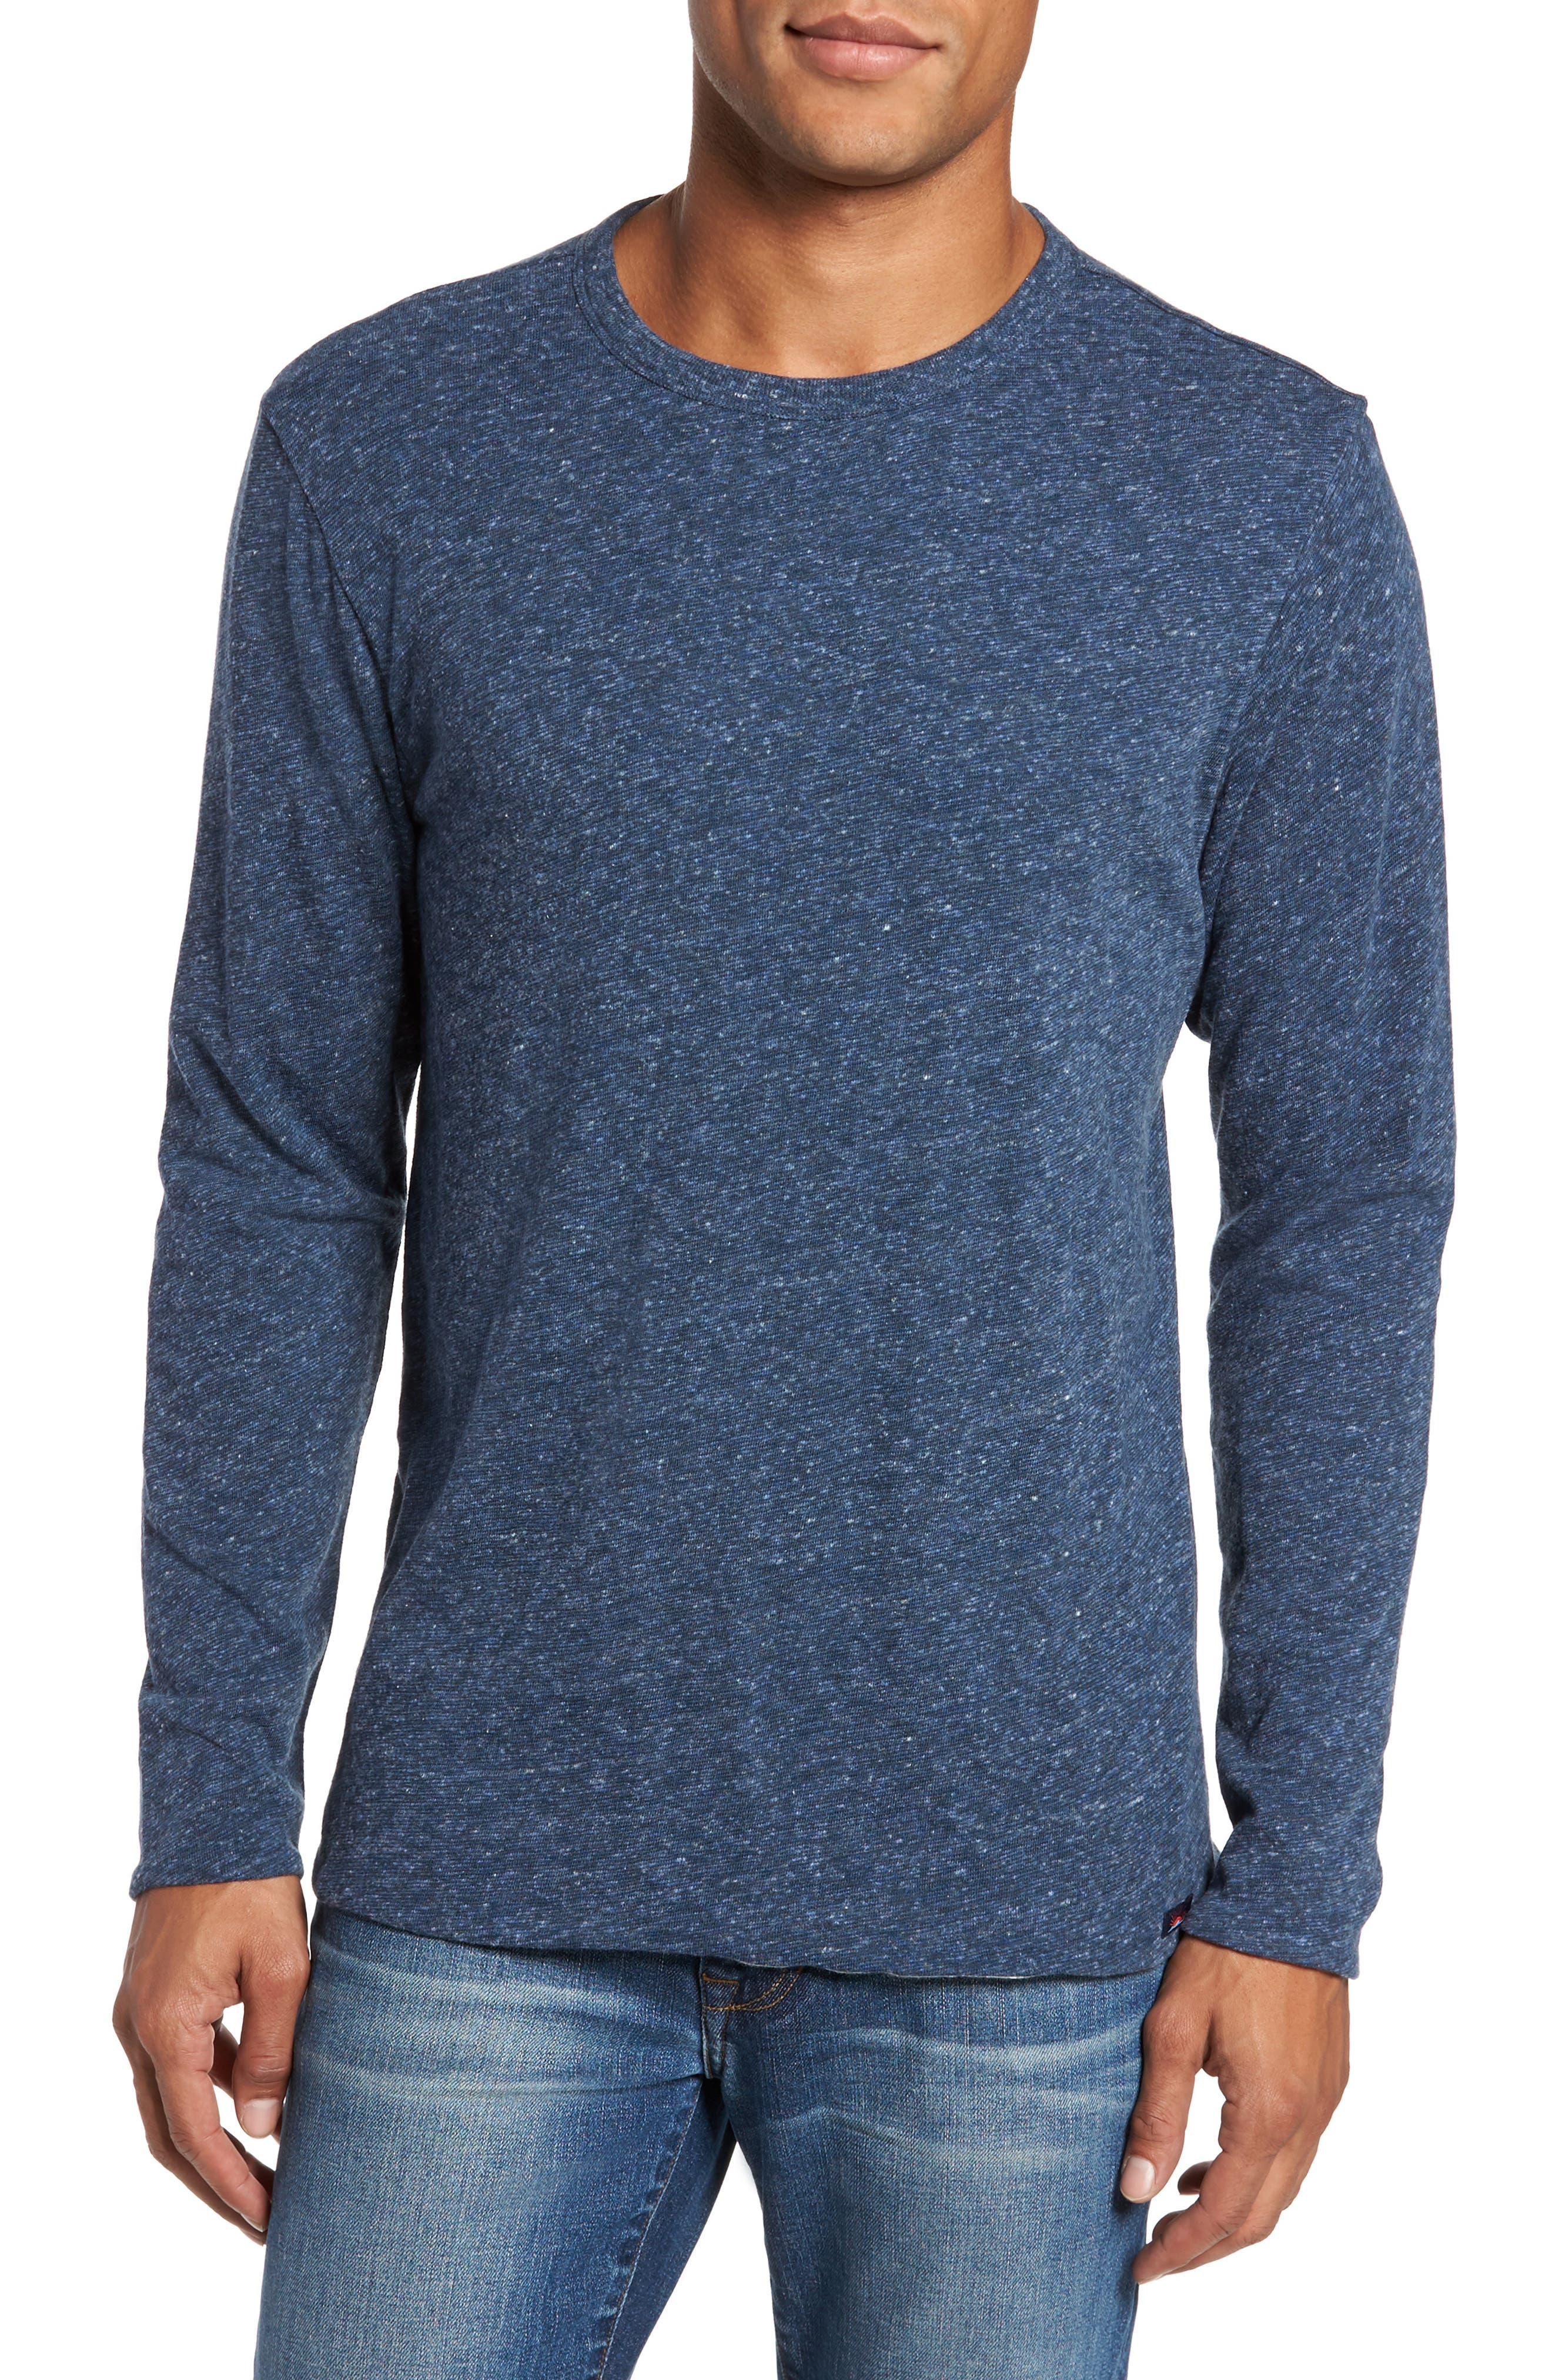 Heathered Reversible Long Sleeve Crewneck T-Shirt,                         Main,                         color, Navy / Grey